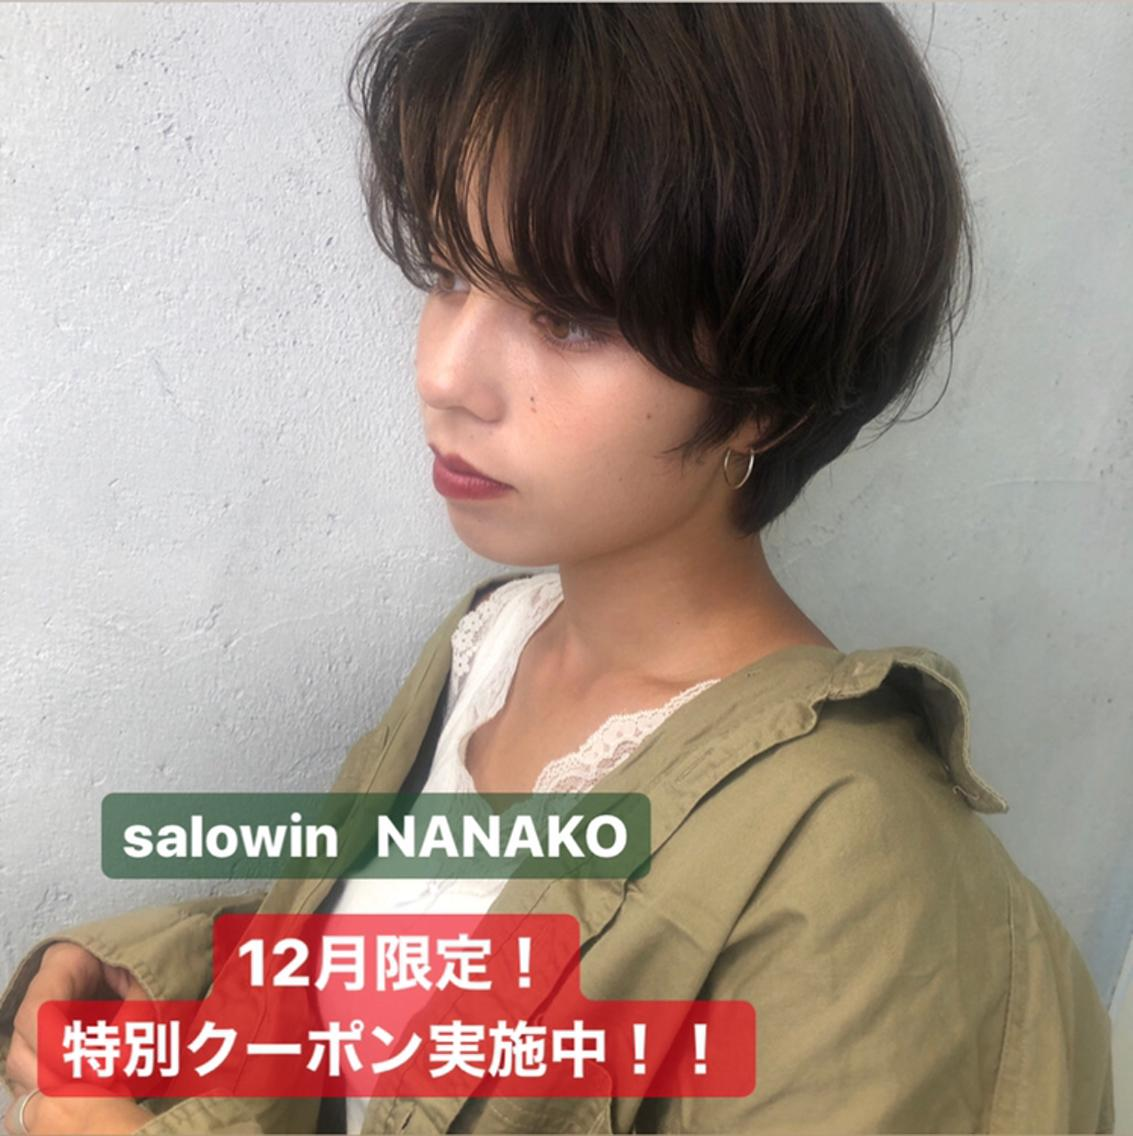 salowin原宿所属・小顔前髪デザイナー❤️NANAKOの掲載